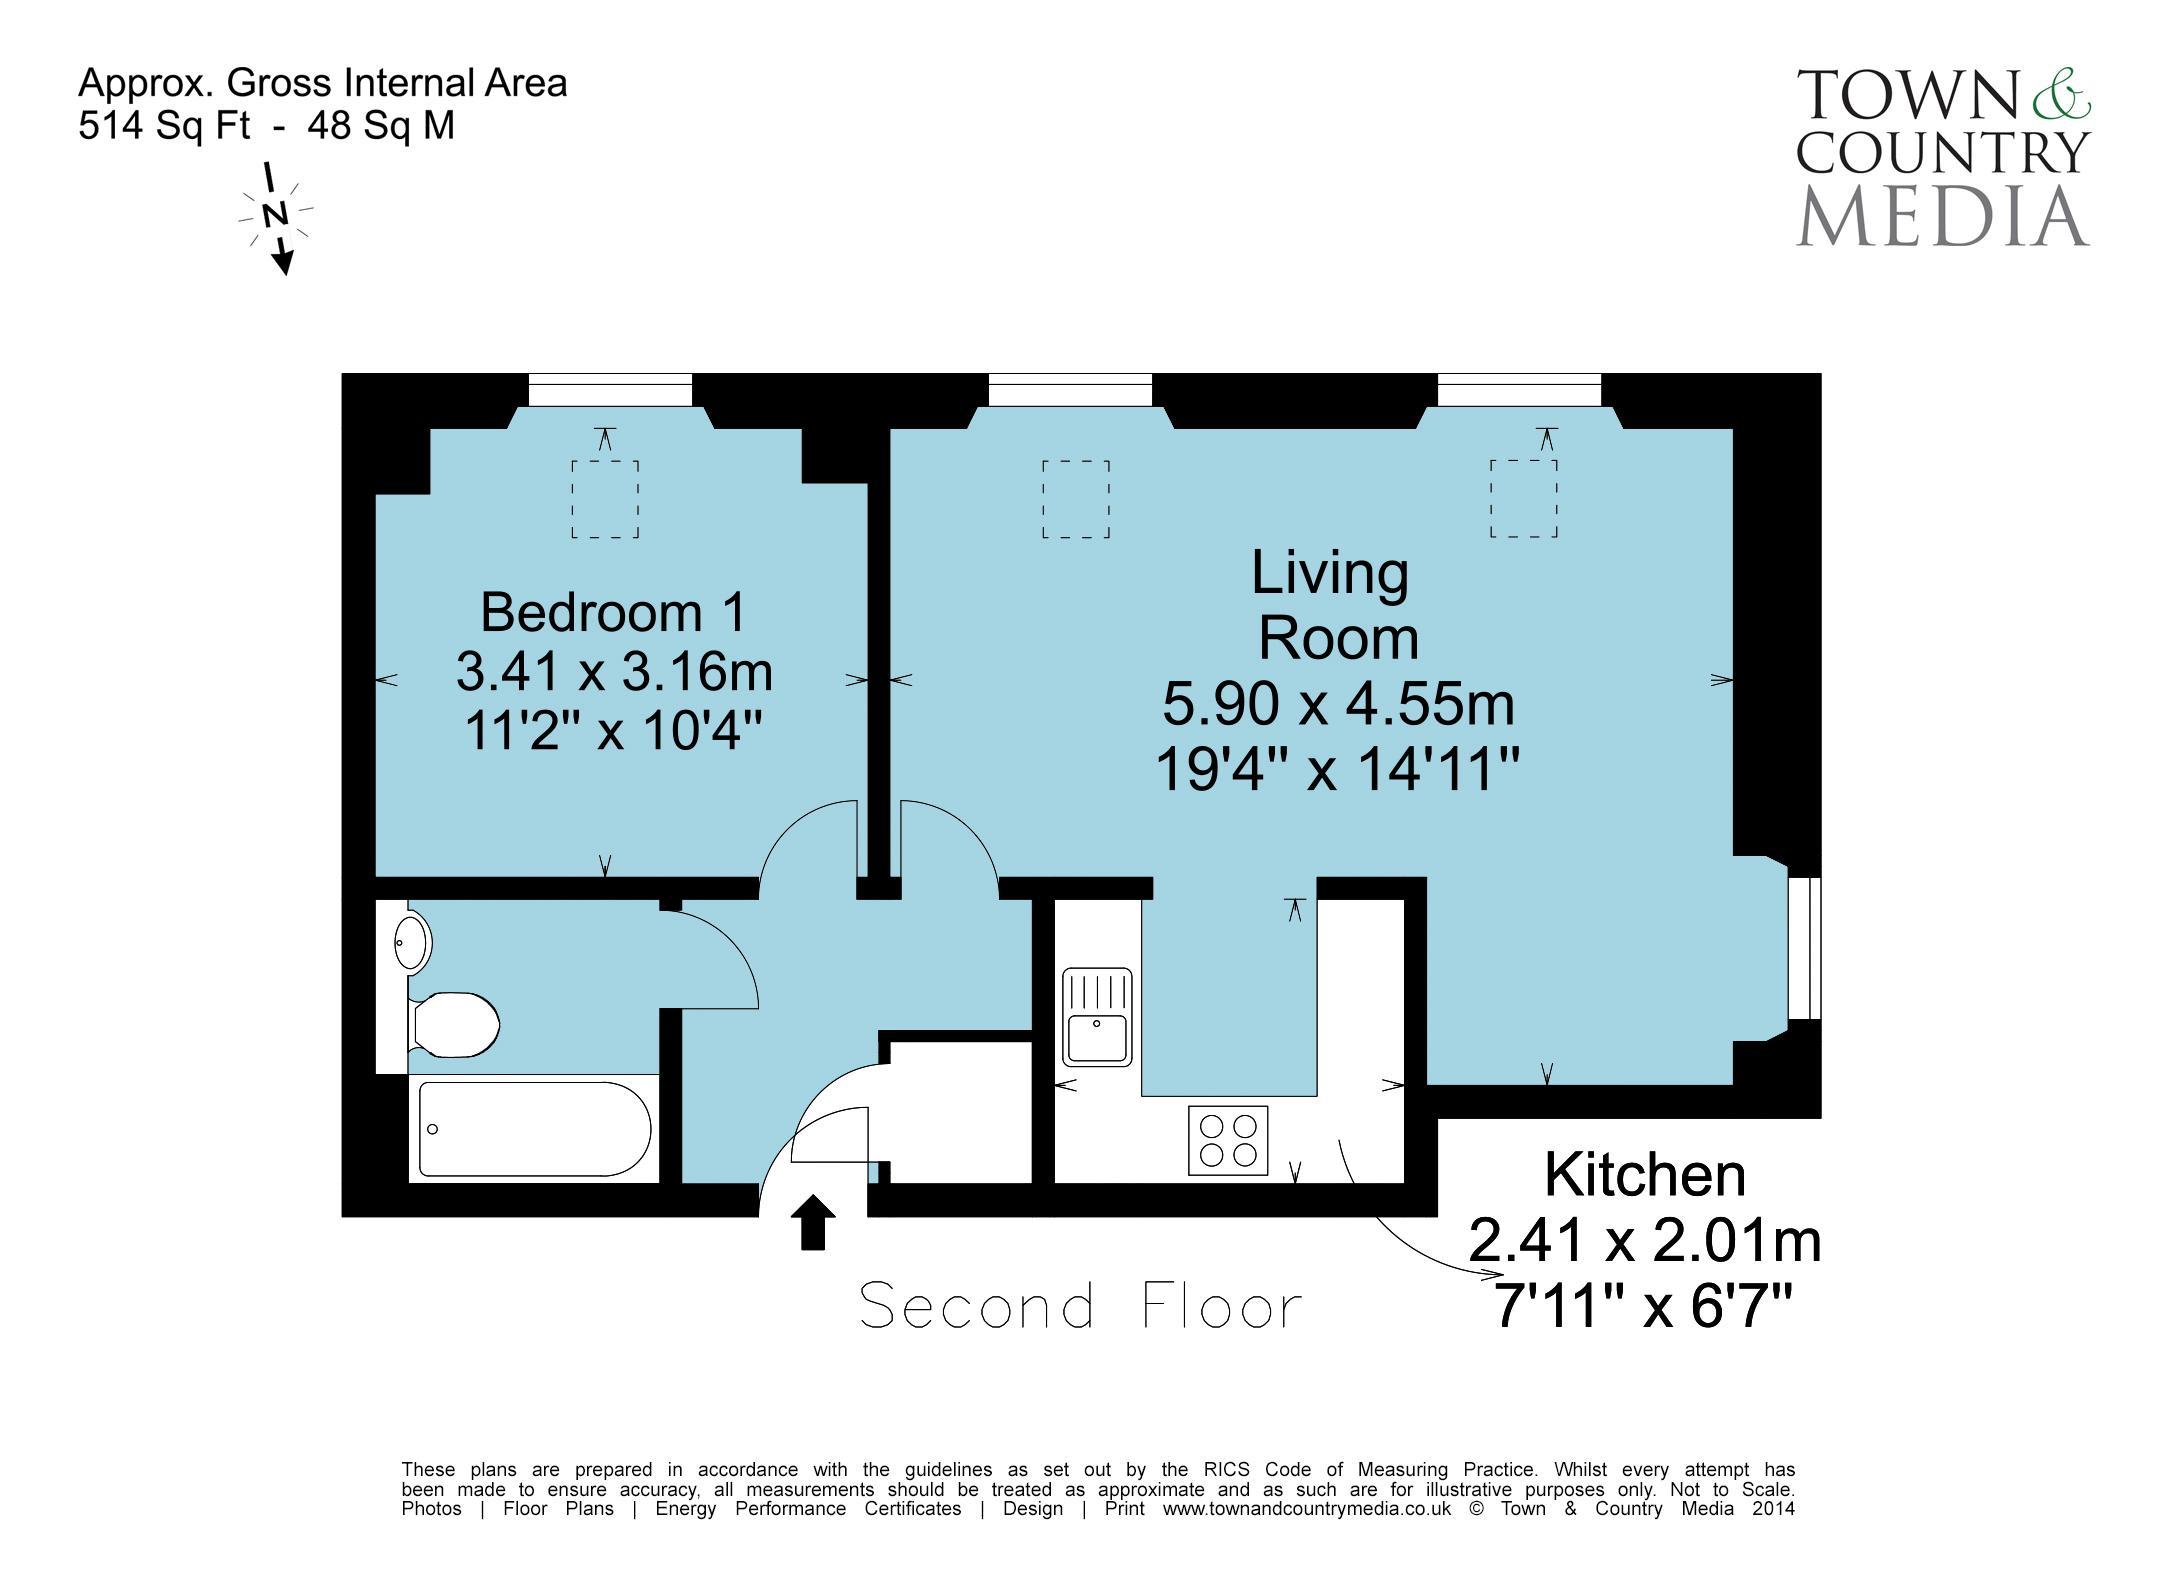 15SPPP-LBR - Floorplan